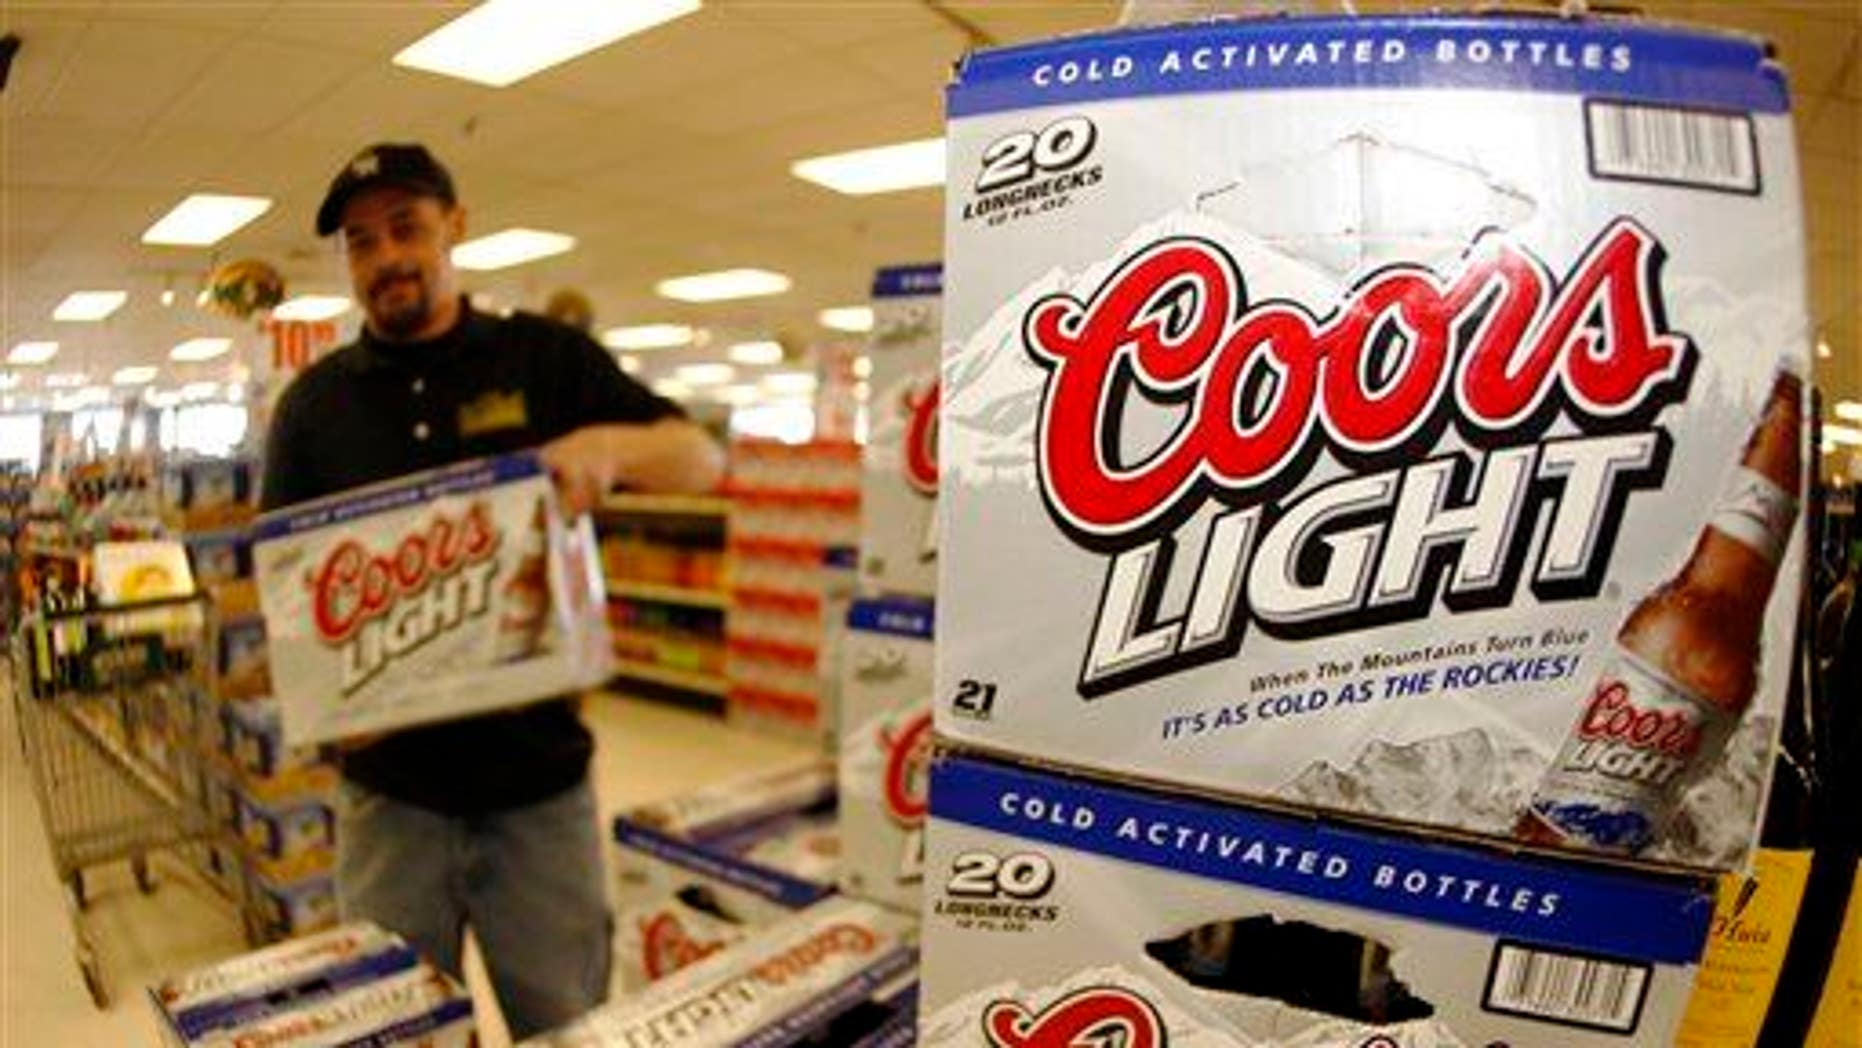 Eli Hughes stocks cases of Coors Light in the Applejack Liquor Store in the west Denver suburb of Wheat Ridge, Colo.